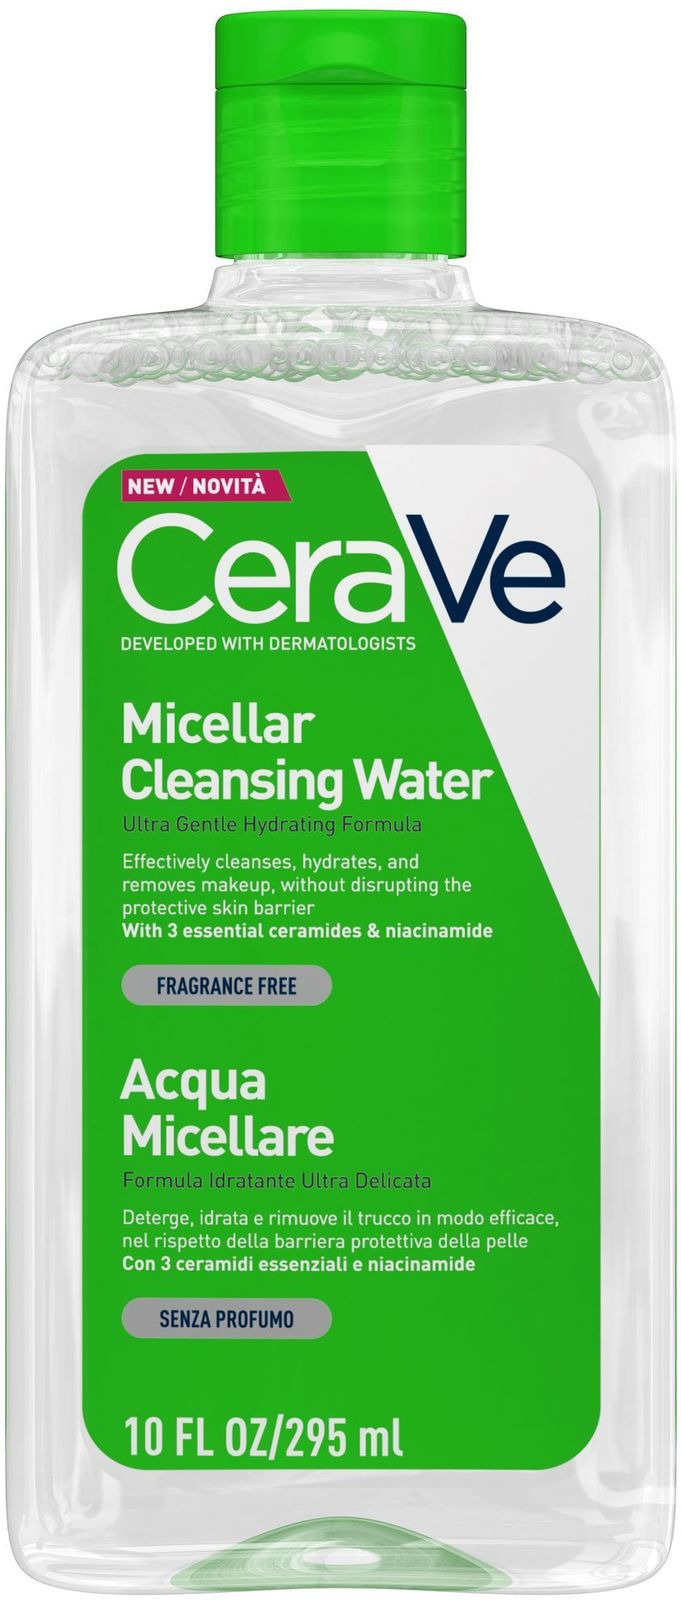 Мицеллярная вода CeraVe, увлажняющая, 295 мл мицеллярная вода cerave увлажняющая 295 мл